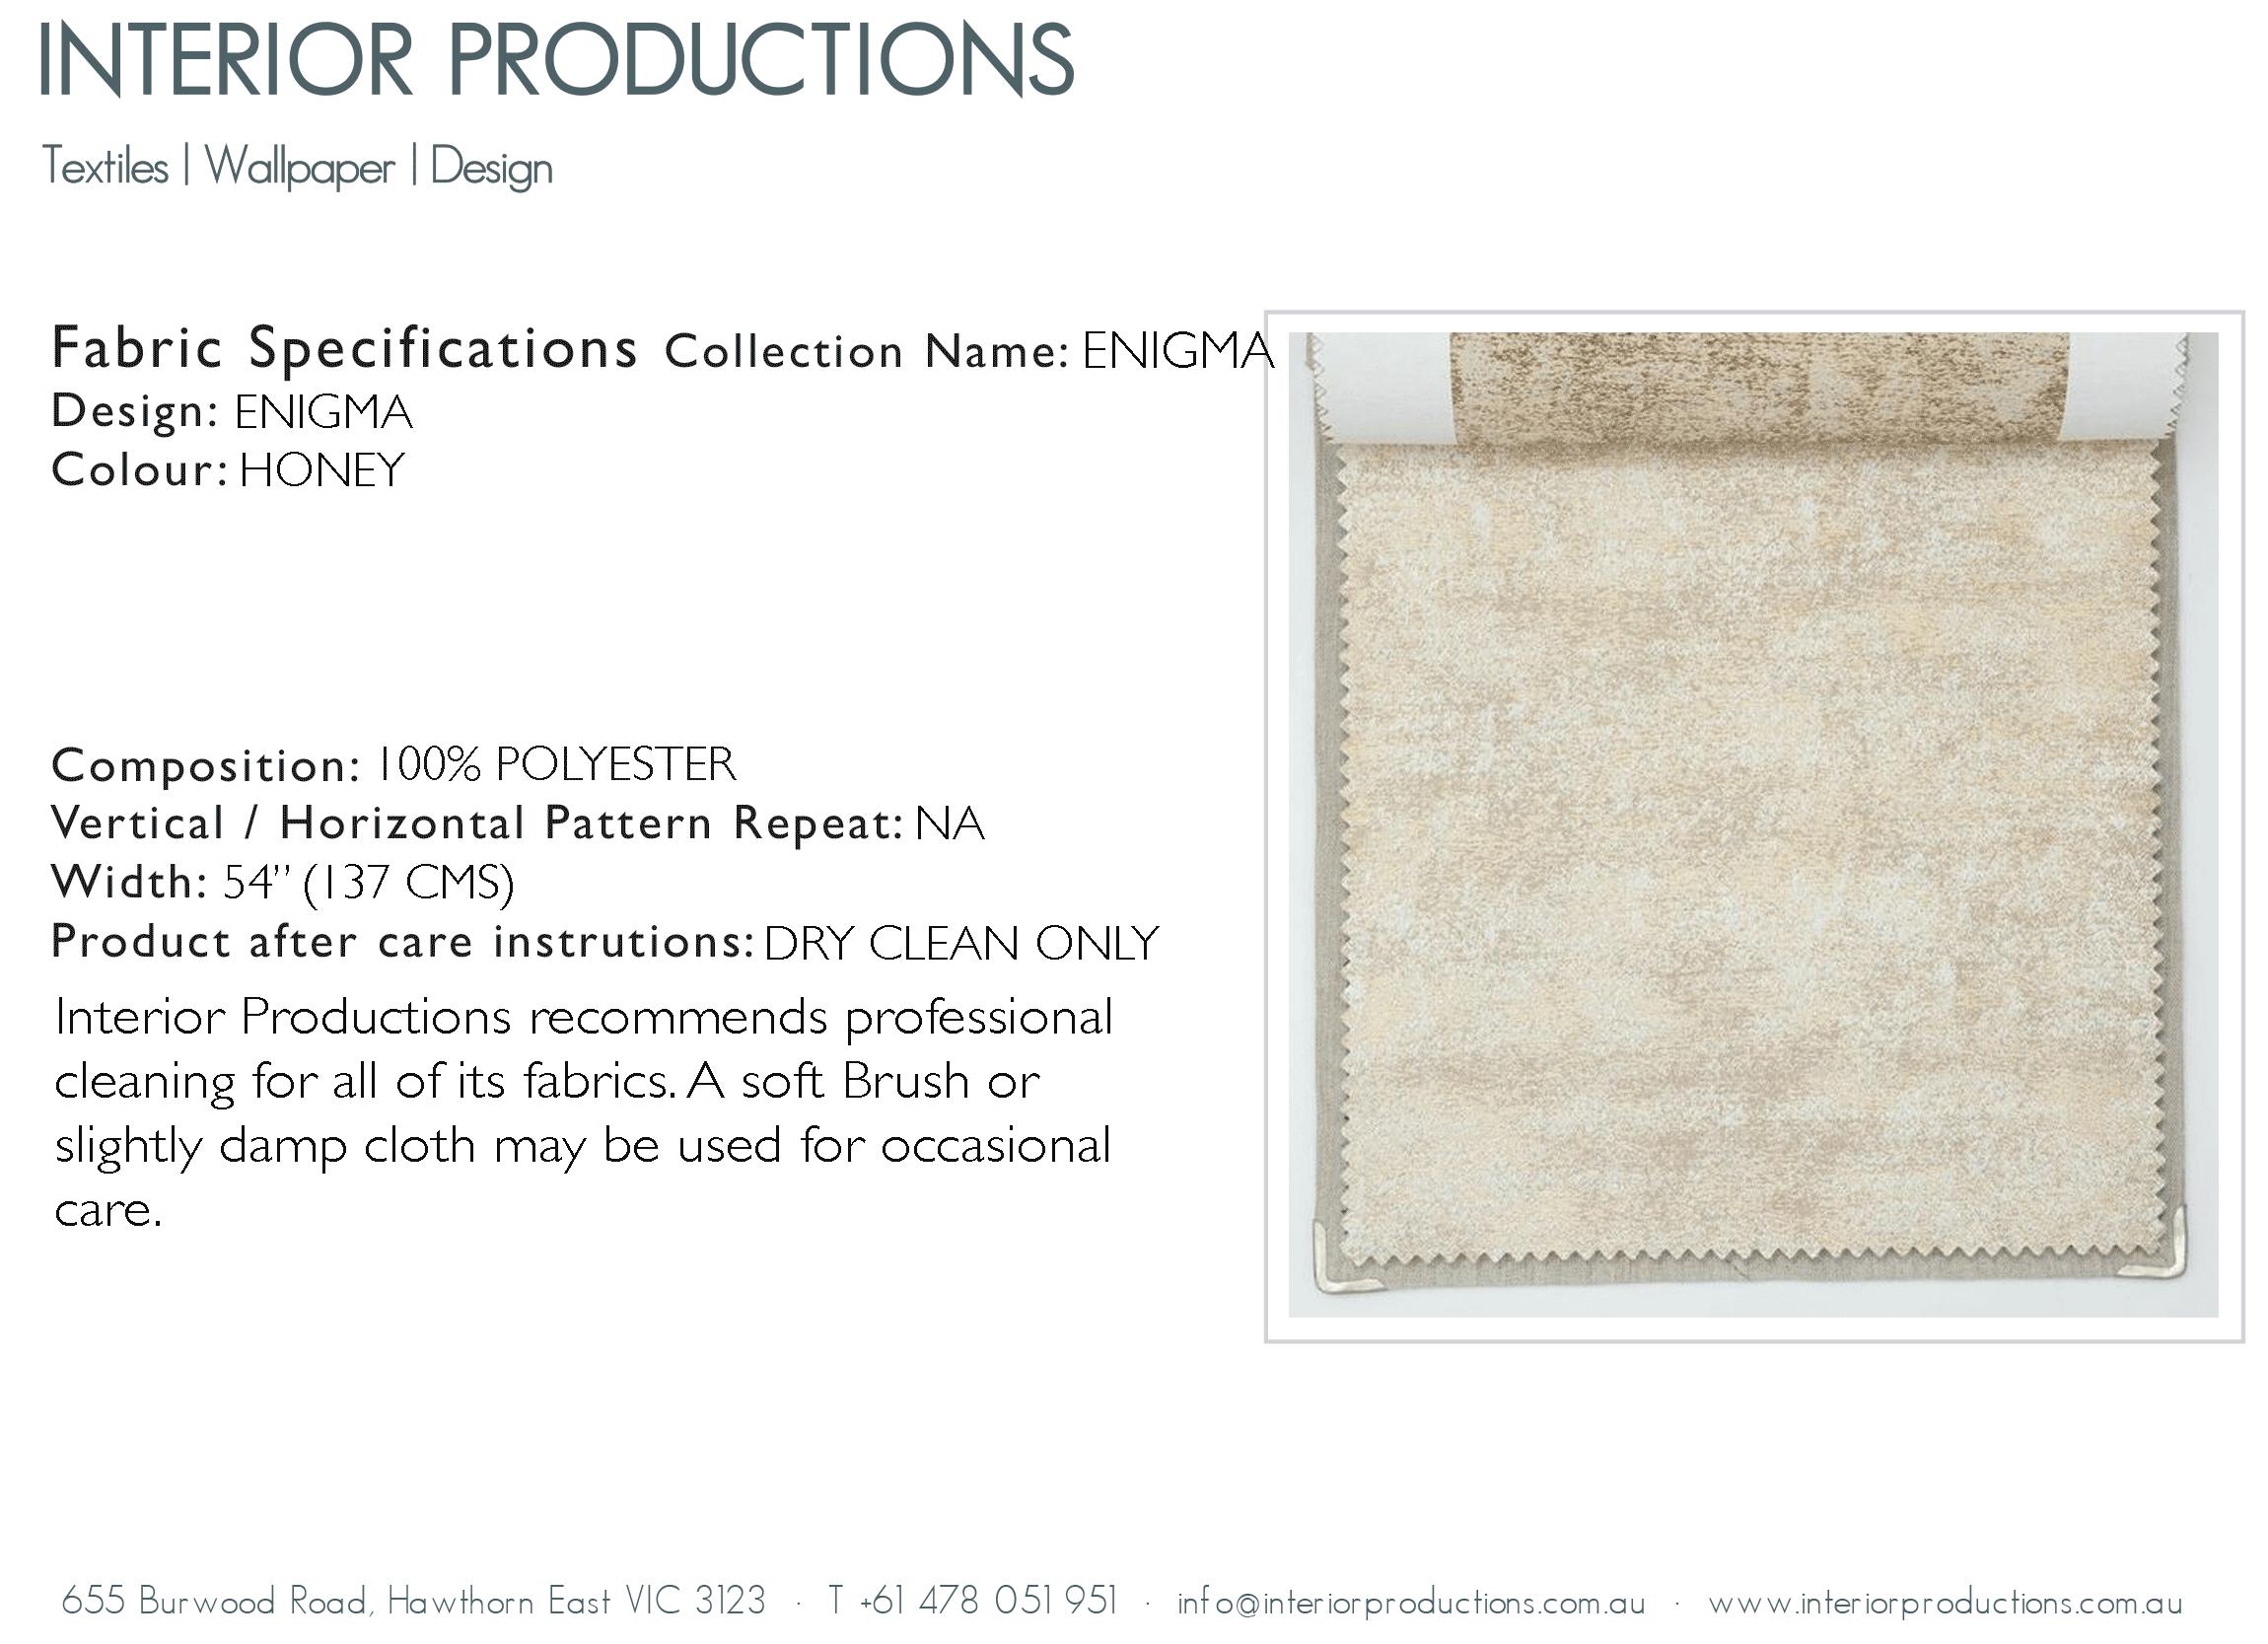 interior_productions_ENIGMA---HONEY